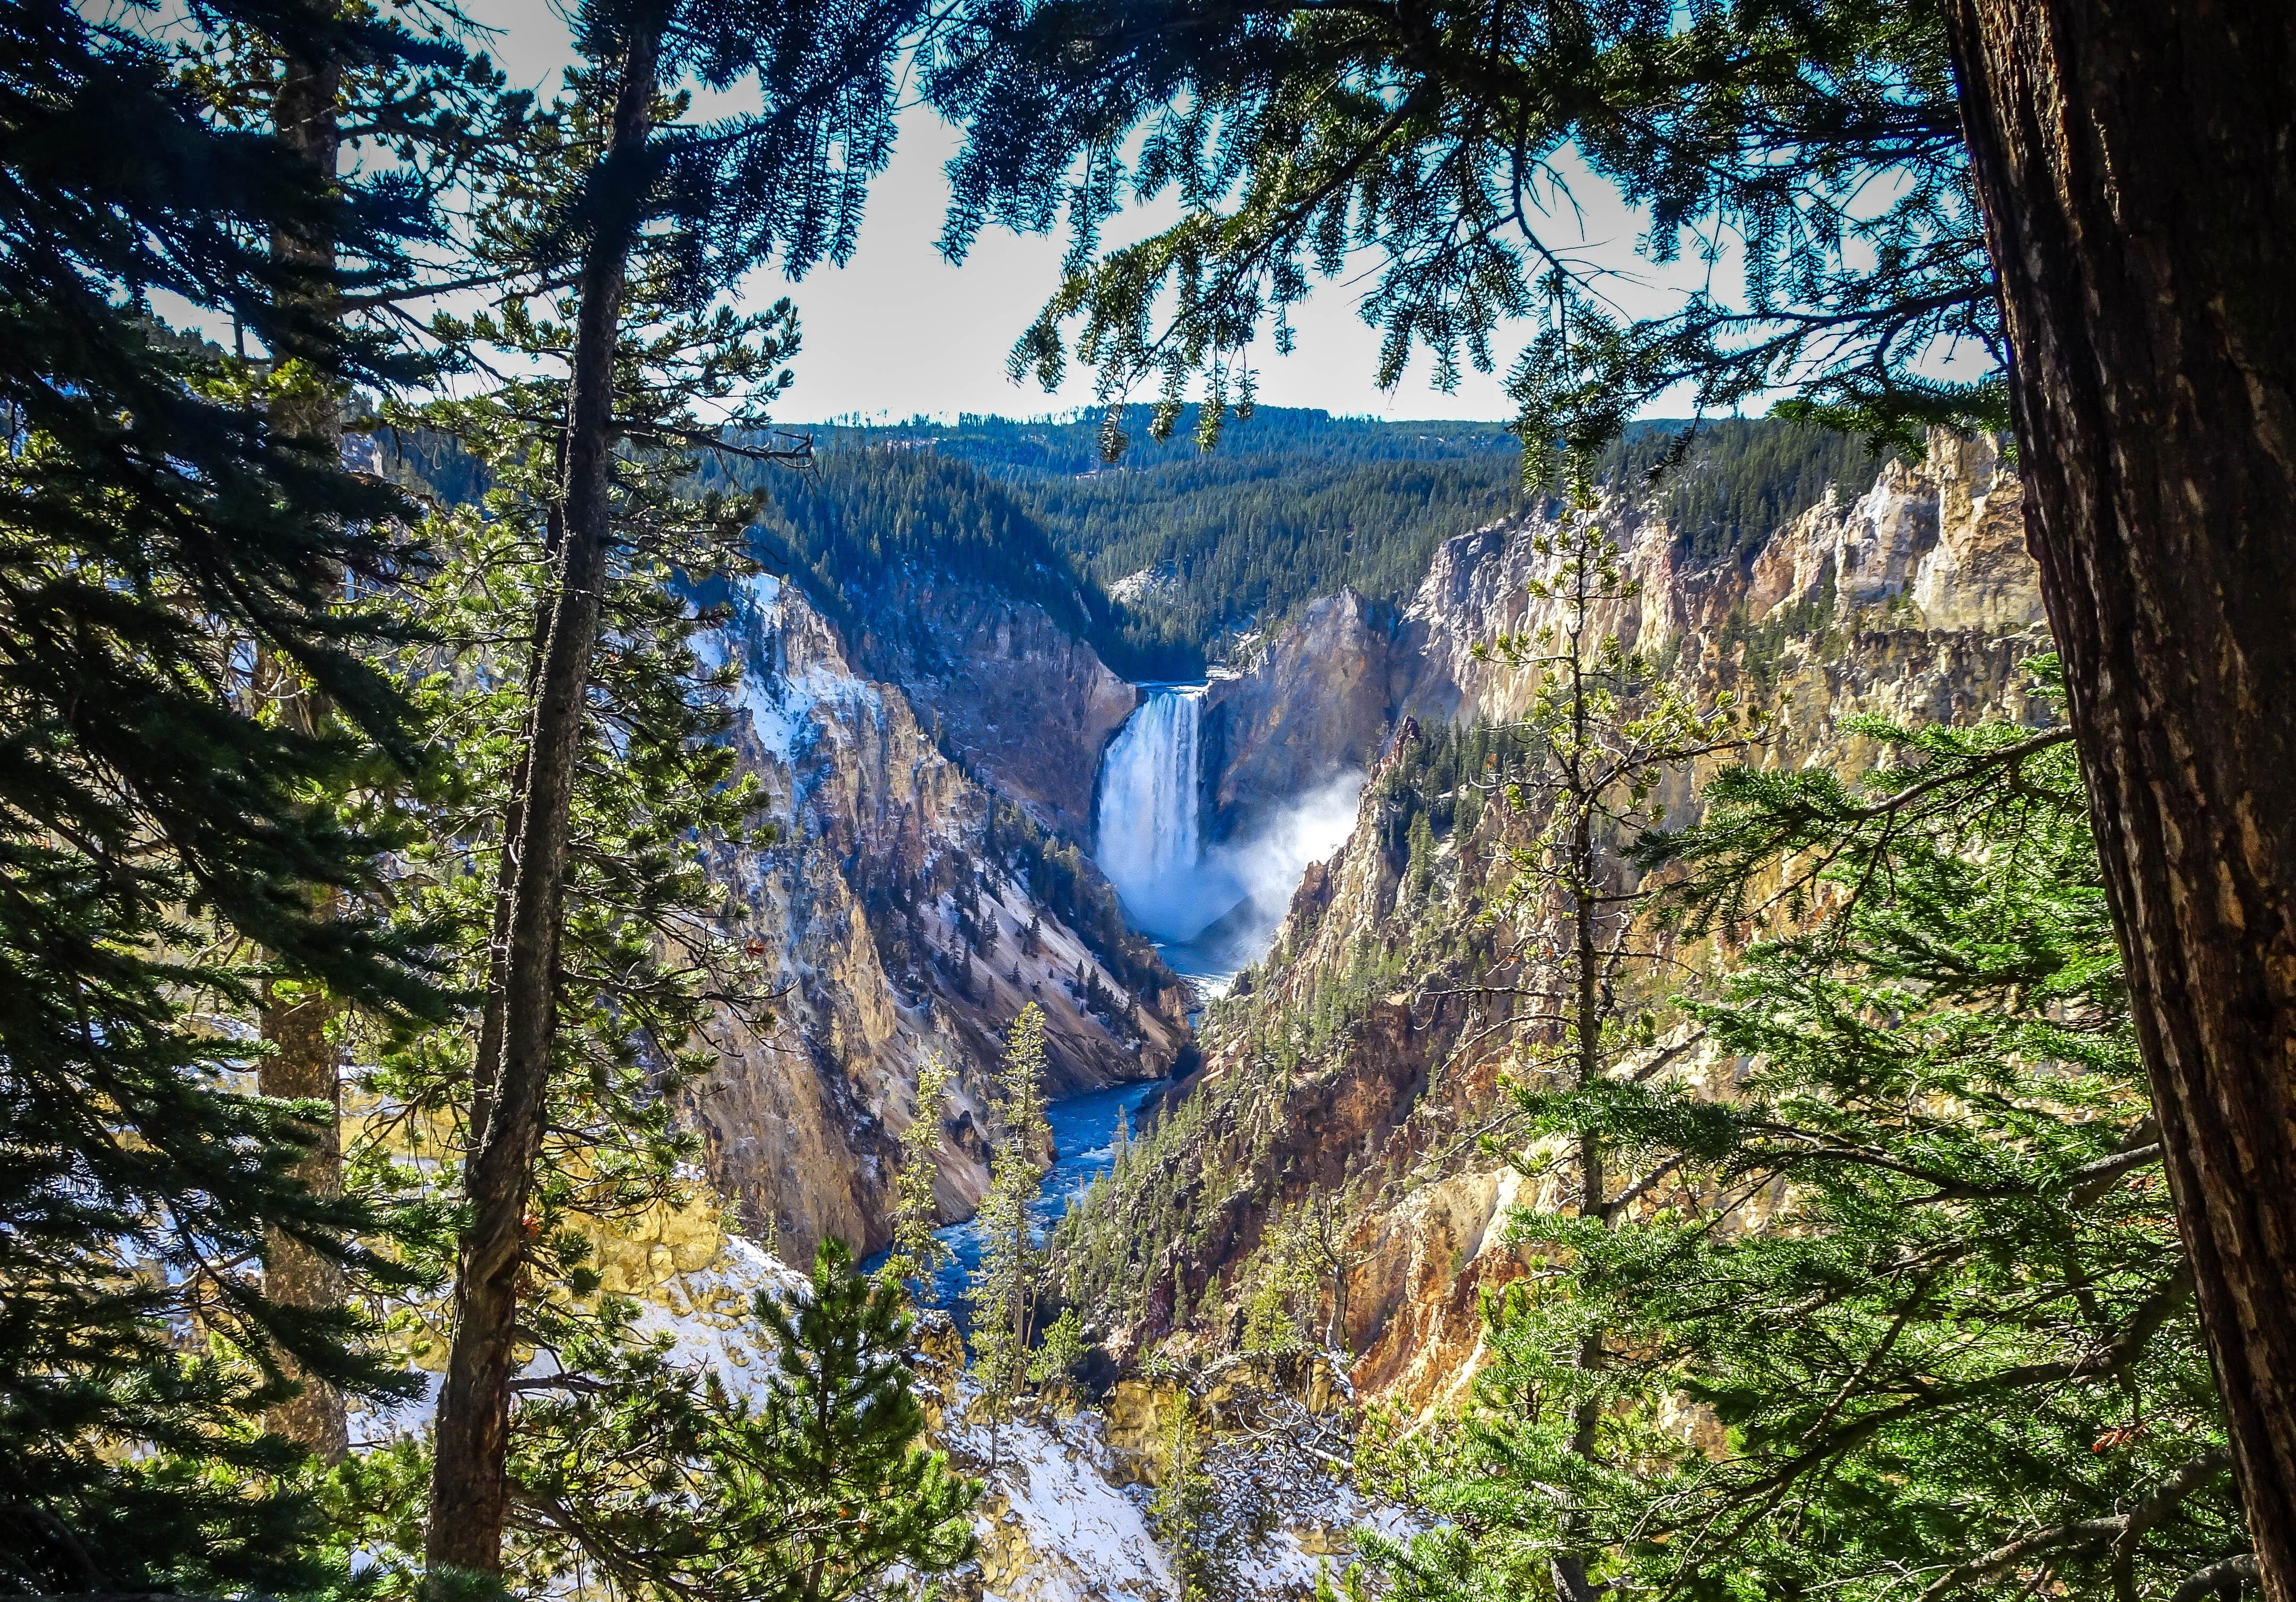 Artist's Point Yellowstone National Park [OC] [4327 x 3020